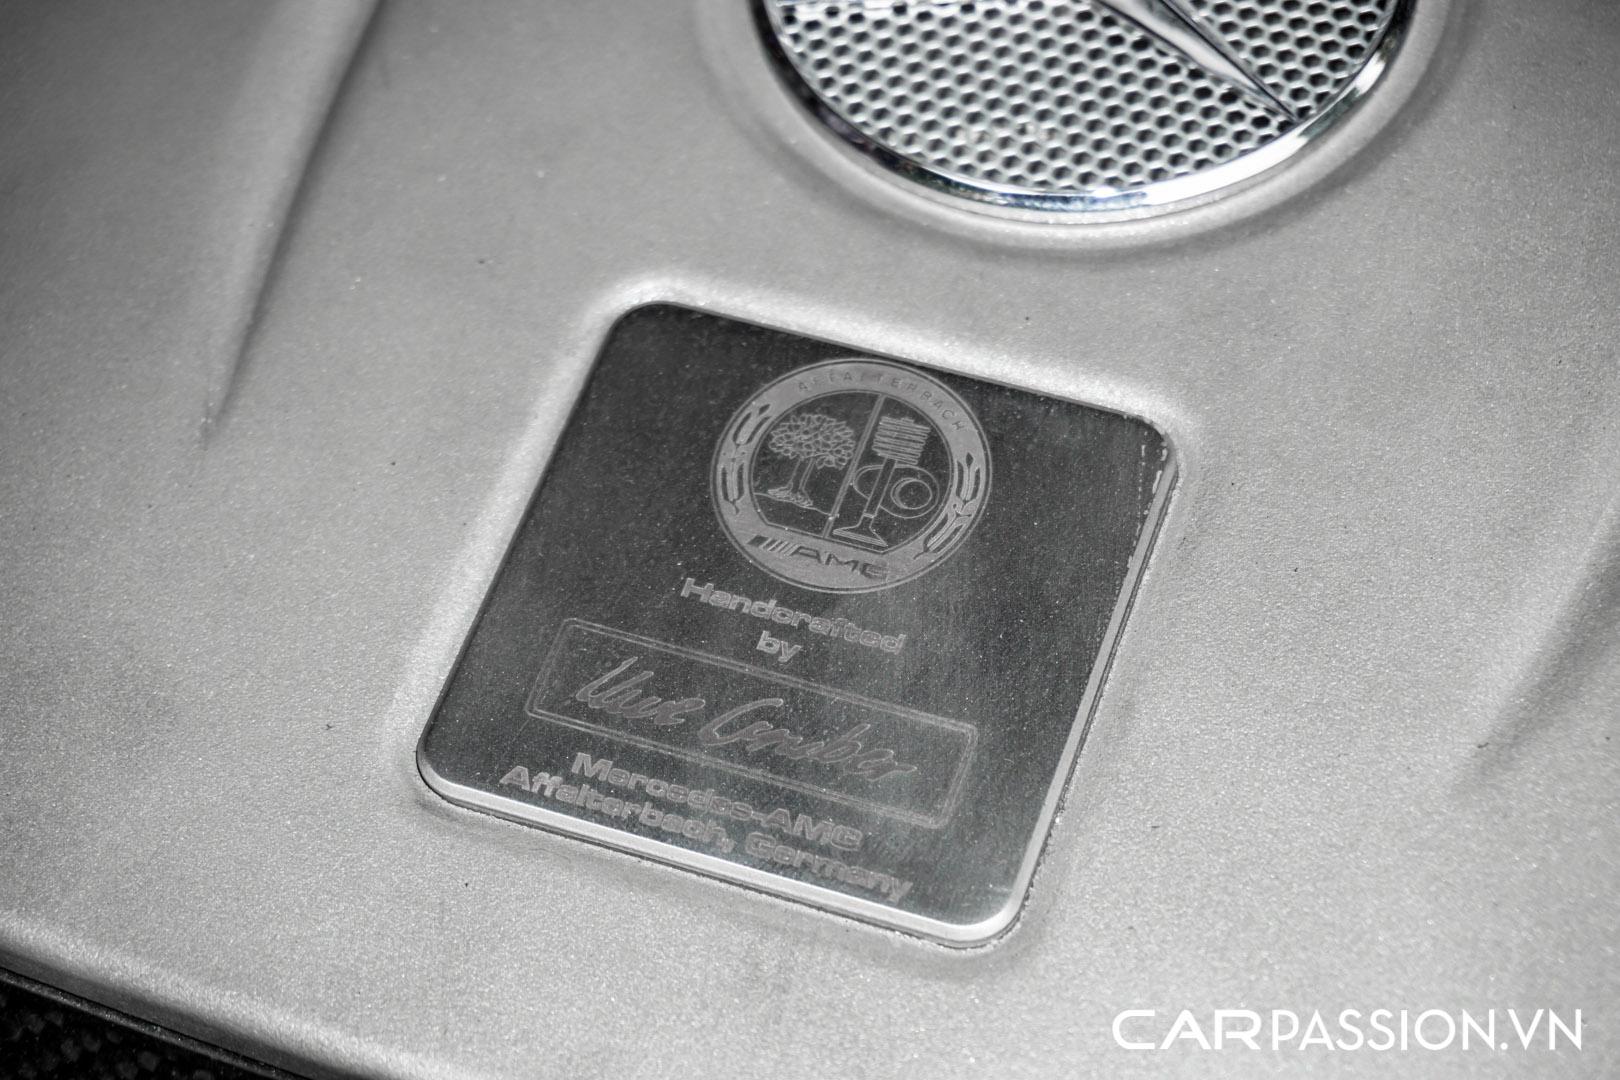 CP-Mercedes-Benz S65 AMG (12).jpg